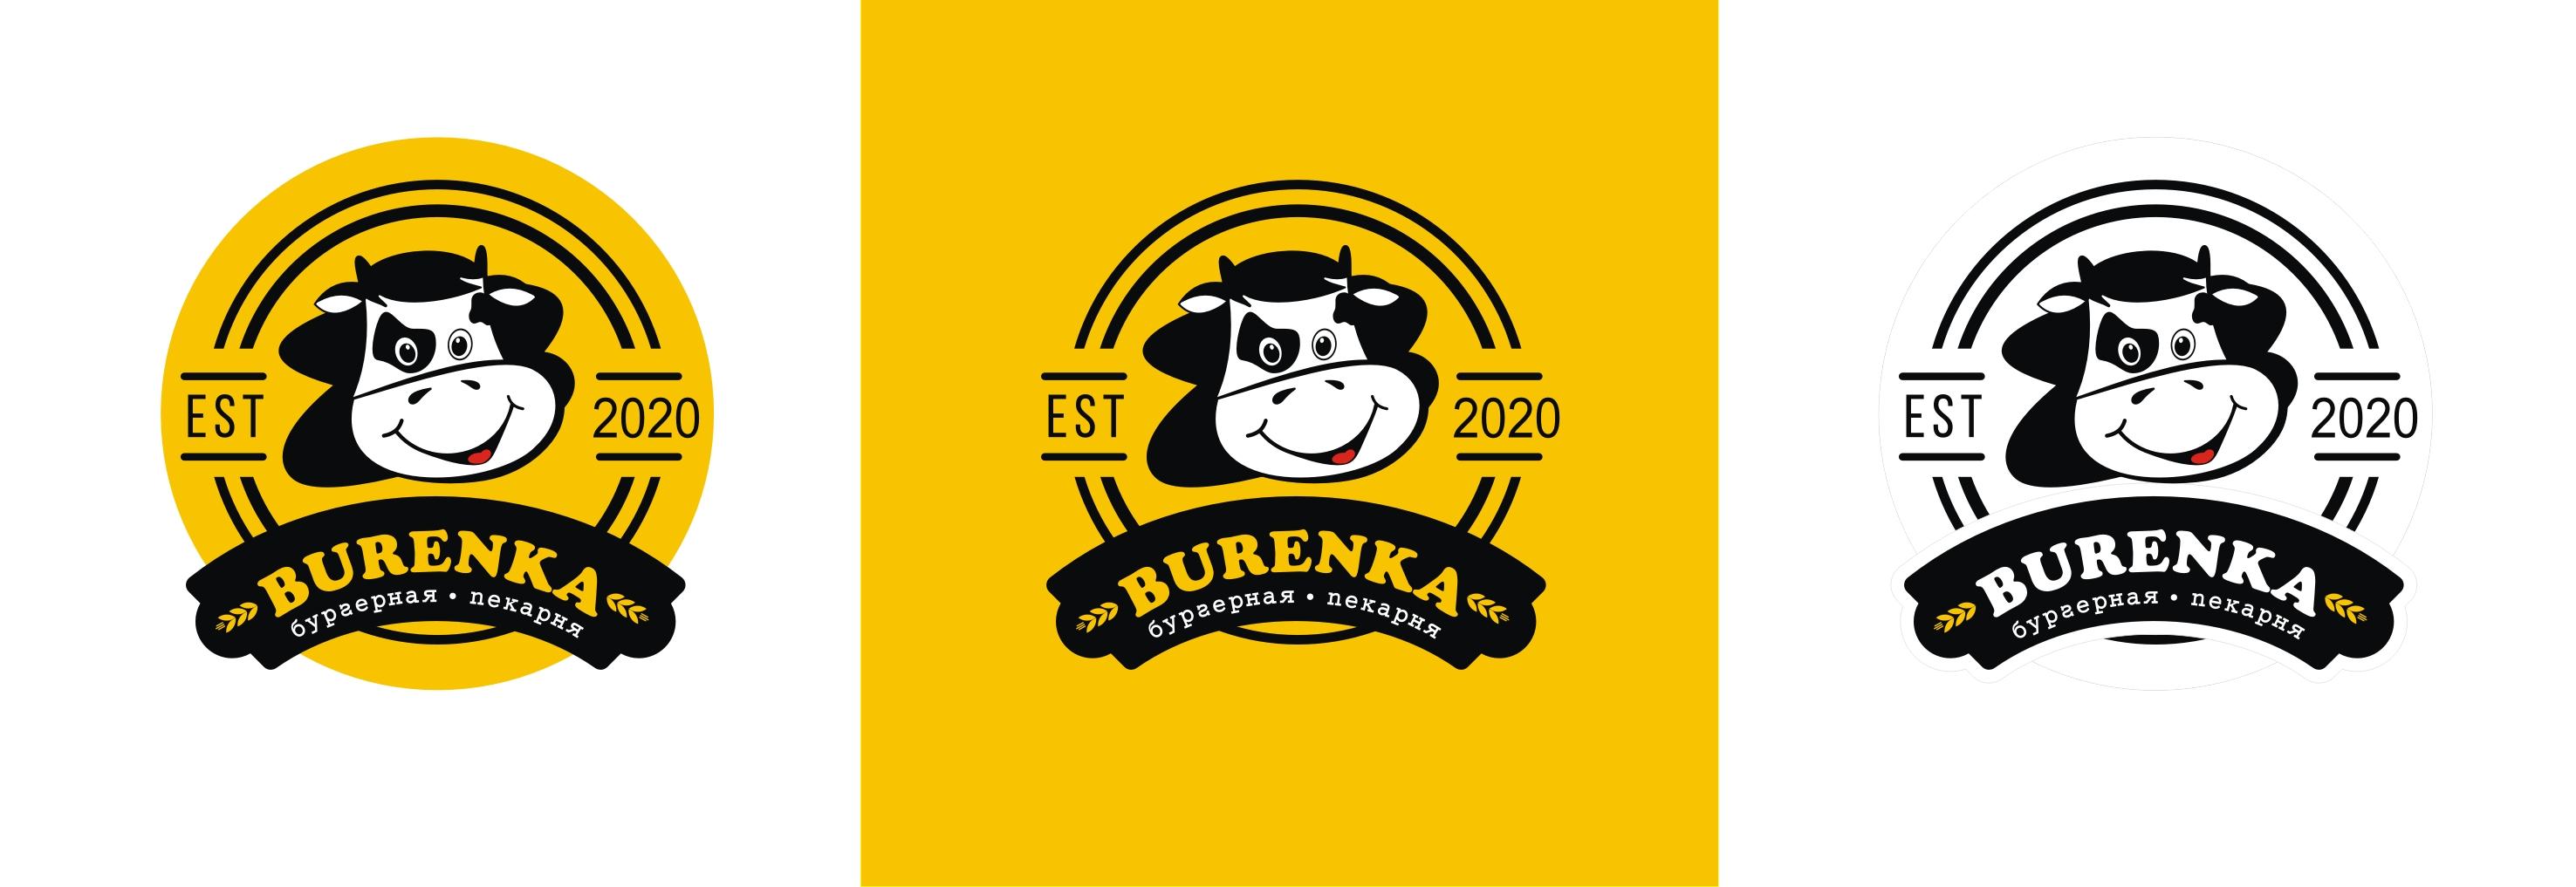 Логотип для Бургерной с Пекарней фото f_0275e1b6a6830650.jpg